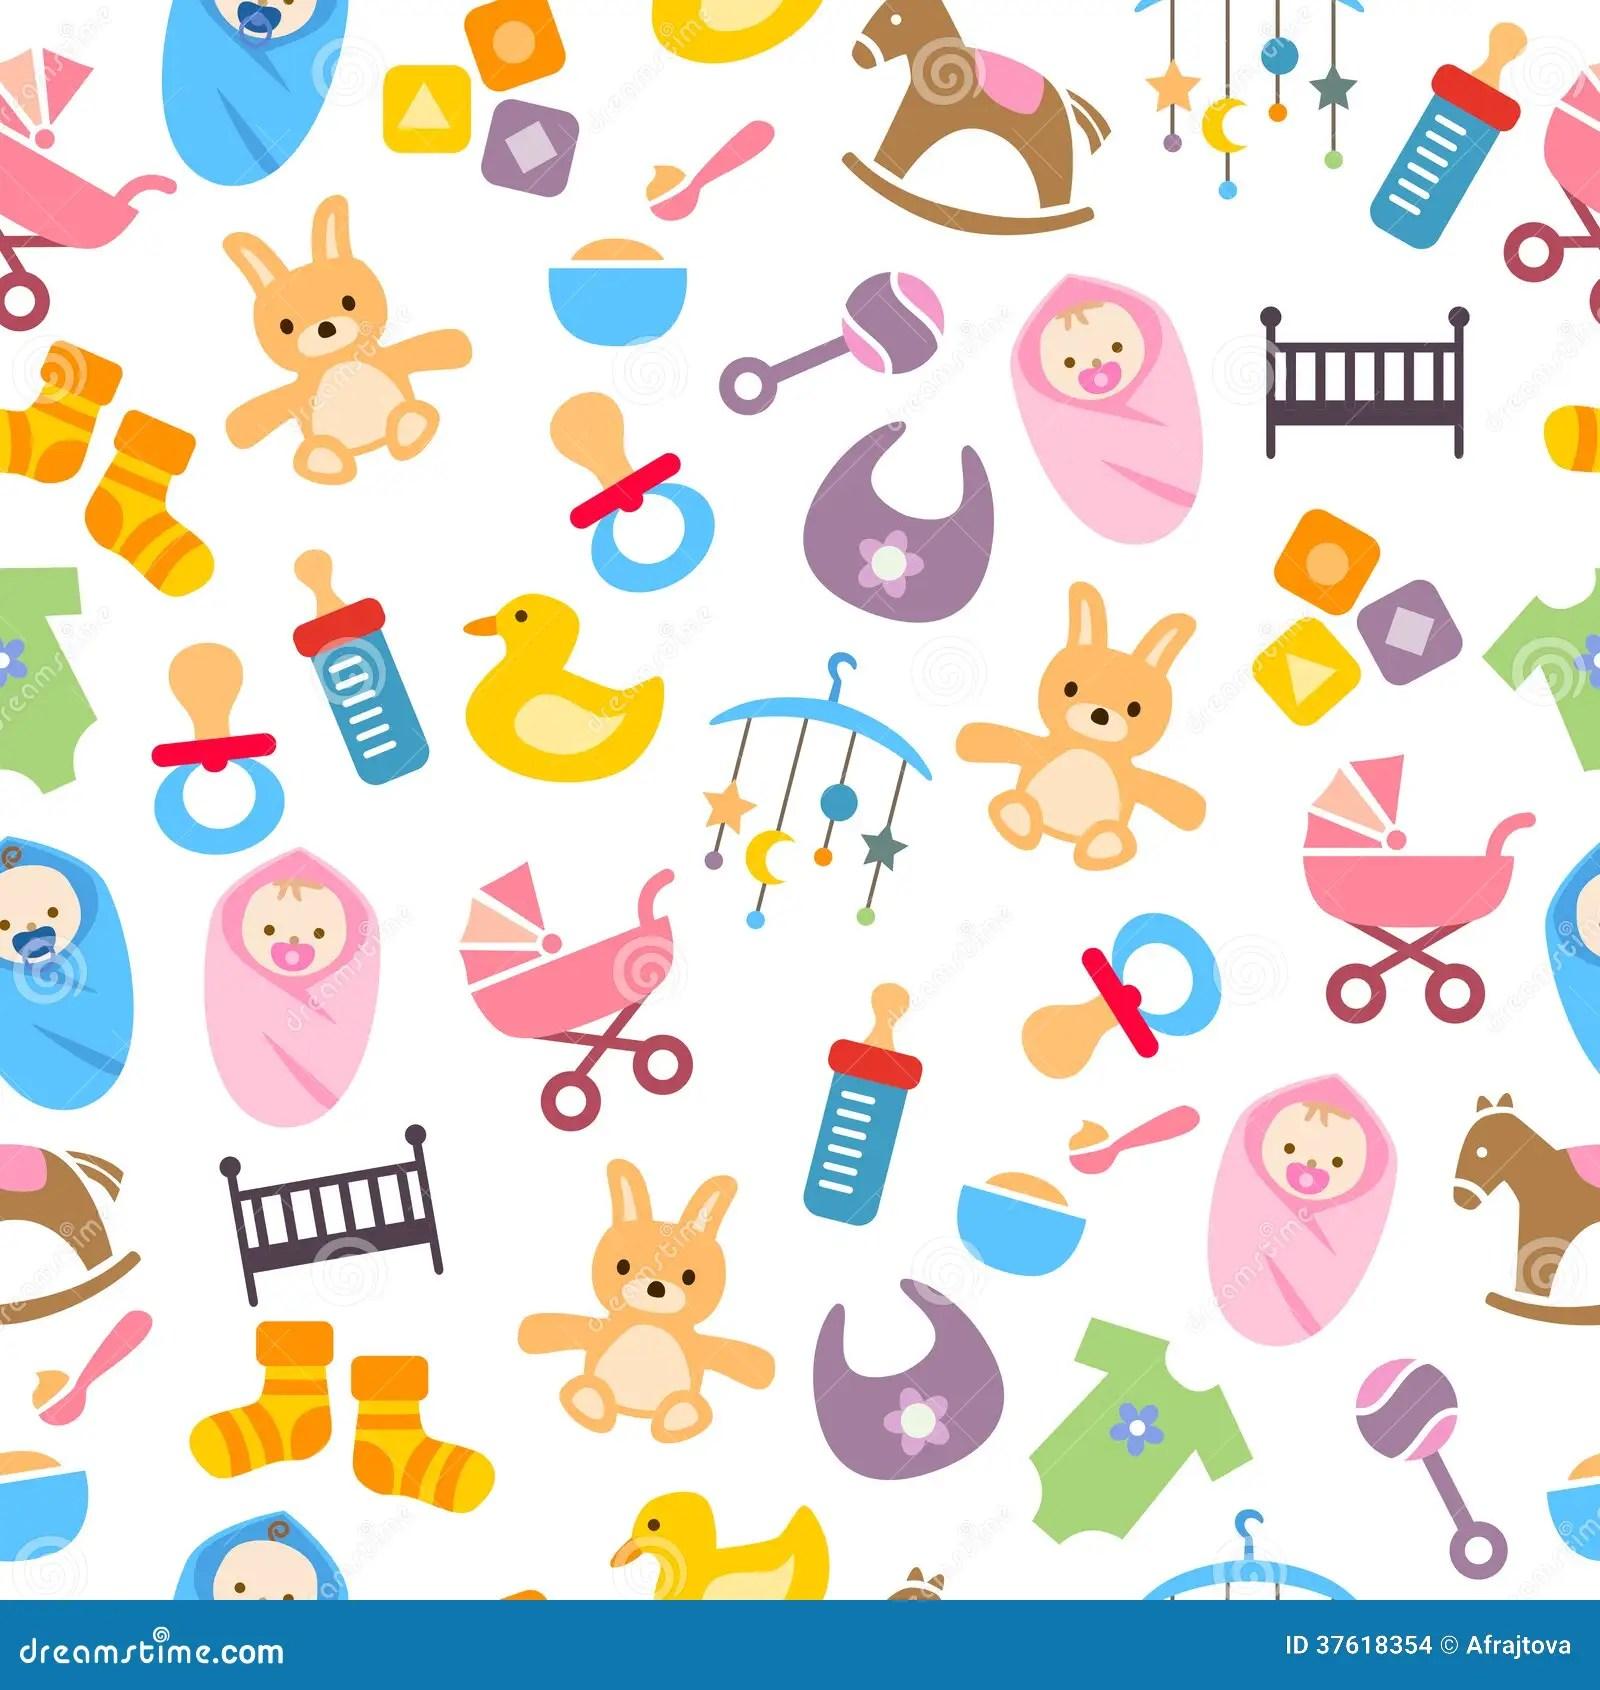 Baby Girl Nursery Wallpaper Borders Cute Baby Pattern Stock Vector Illustration Of Horse